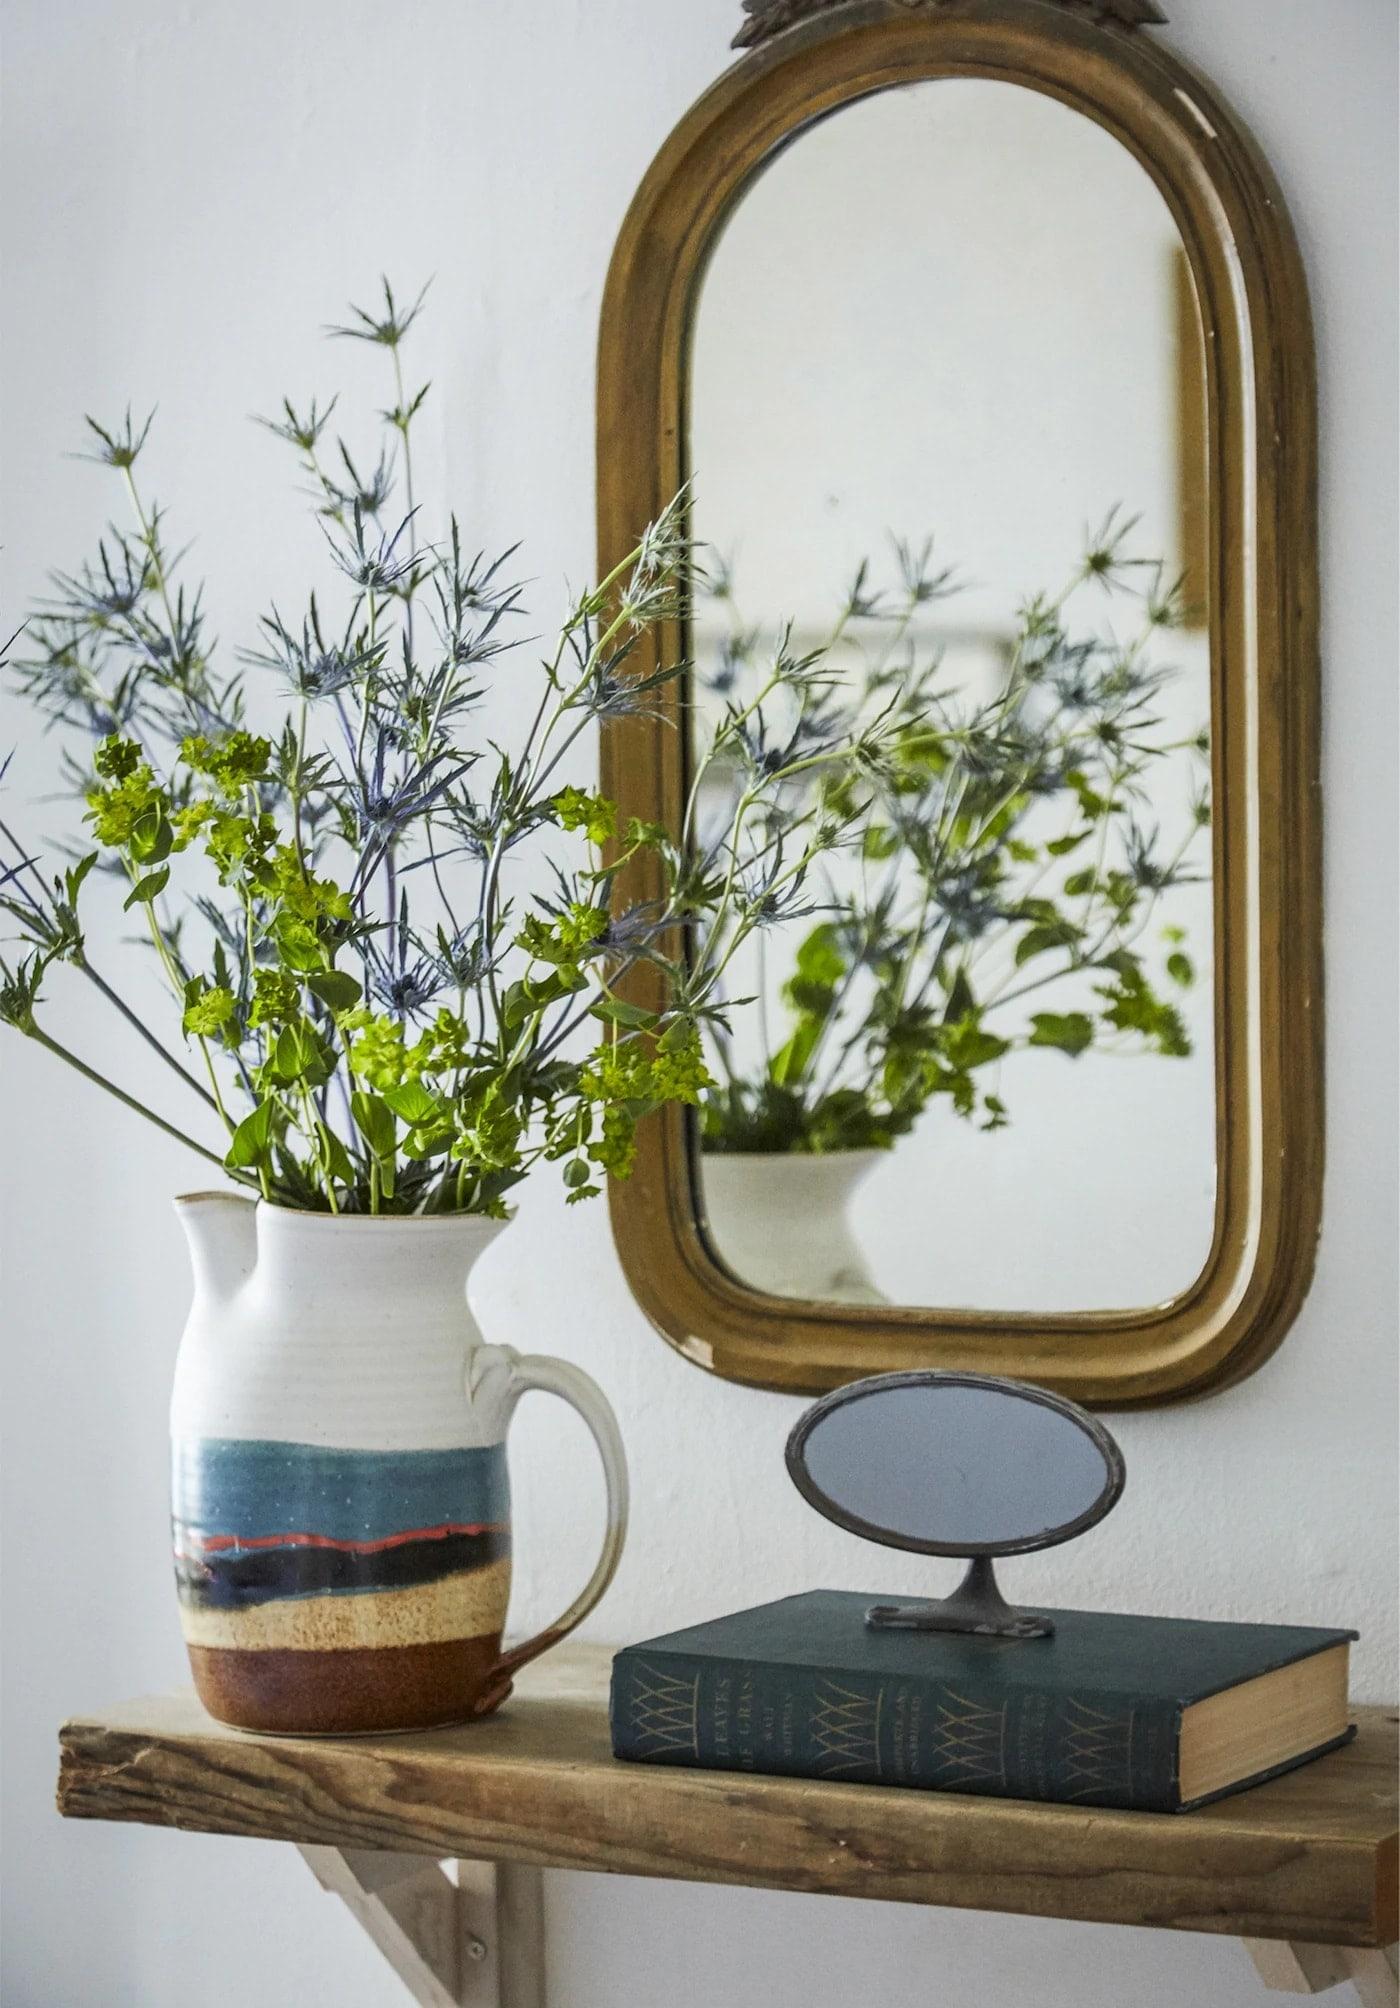 ikea duvar aksesuarlari ile dekorasyon fikirleri (24)-min-min